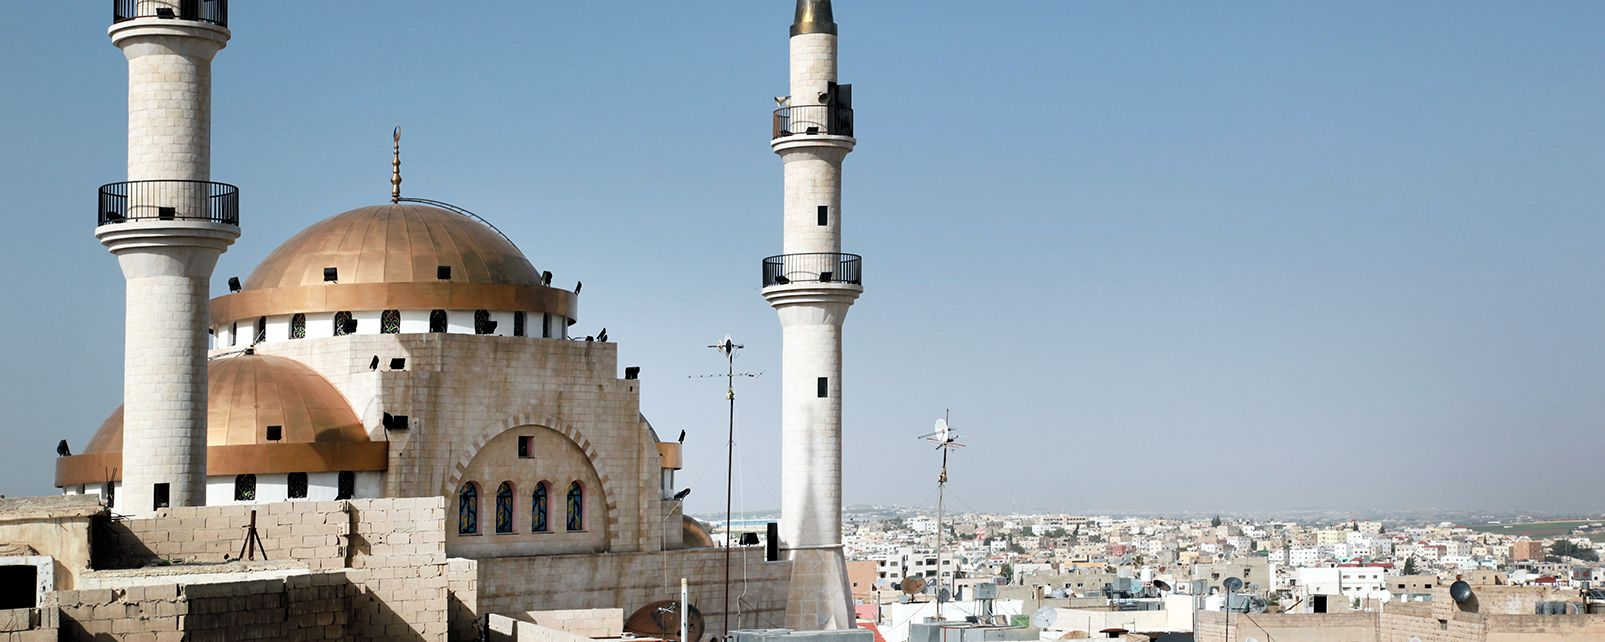 Moyen-Orient; Jordanie; Madaba;